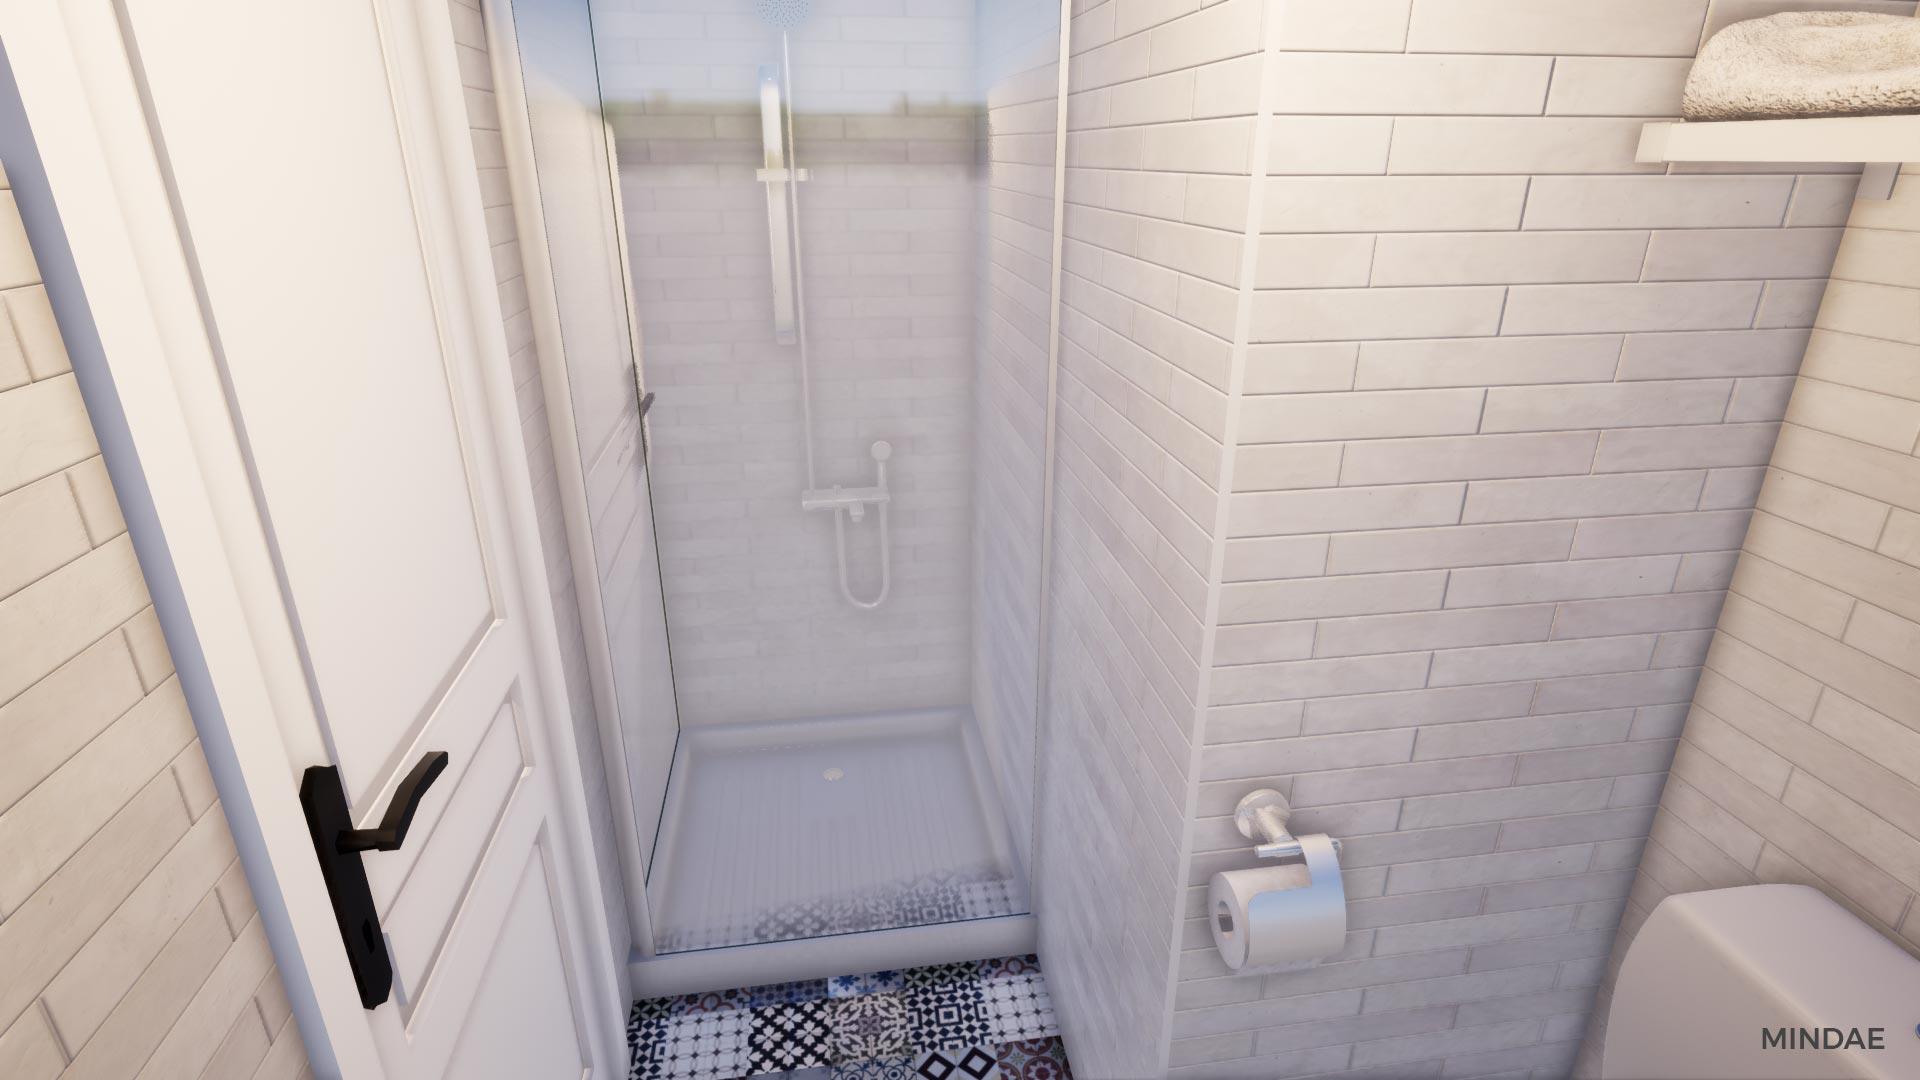 Mindae_3D_as_immobilier_projet_A_garage_duplex_studio_investisseur_caen-(5)